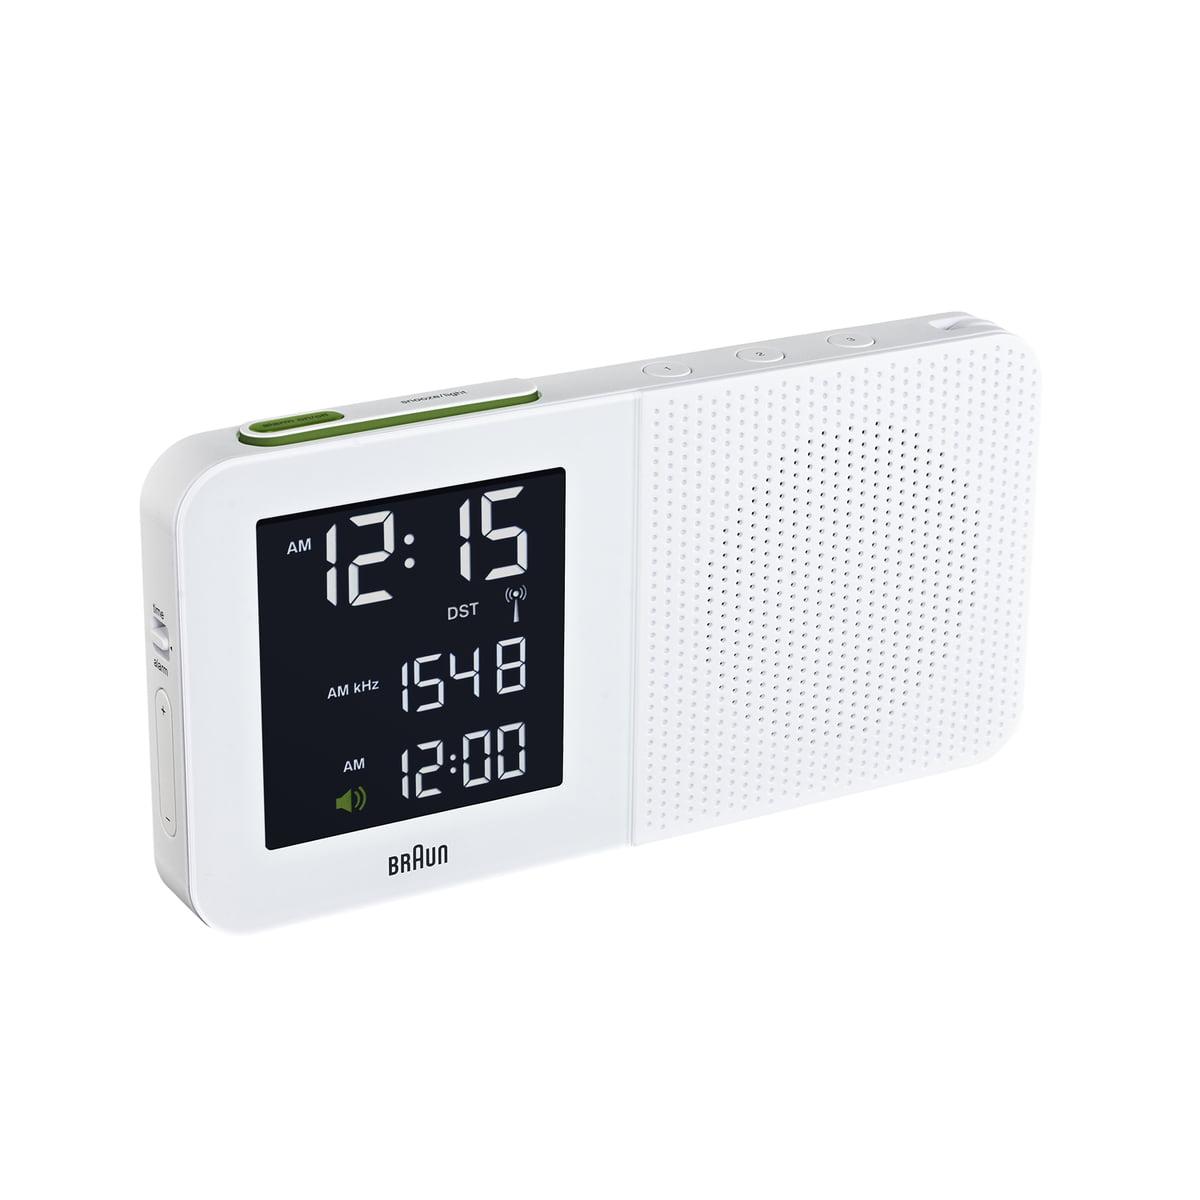 Digitaler Radiowecker BNC010, weiß